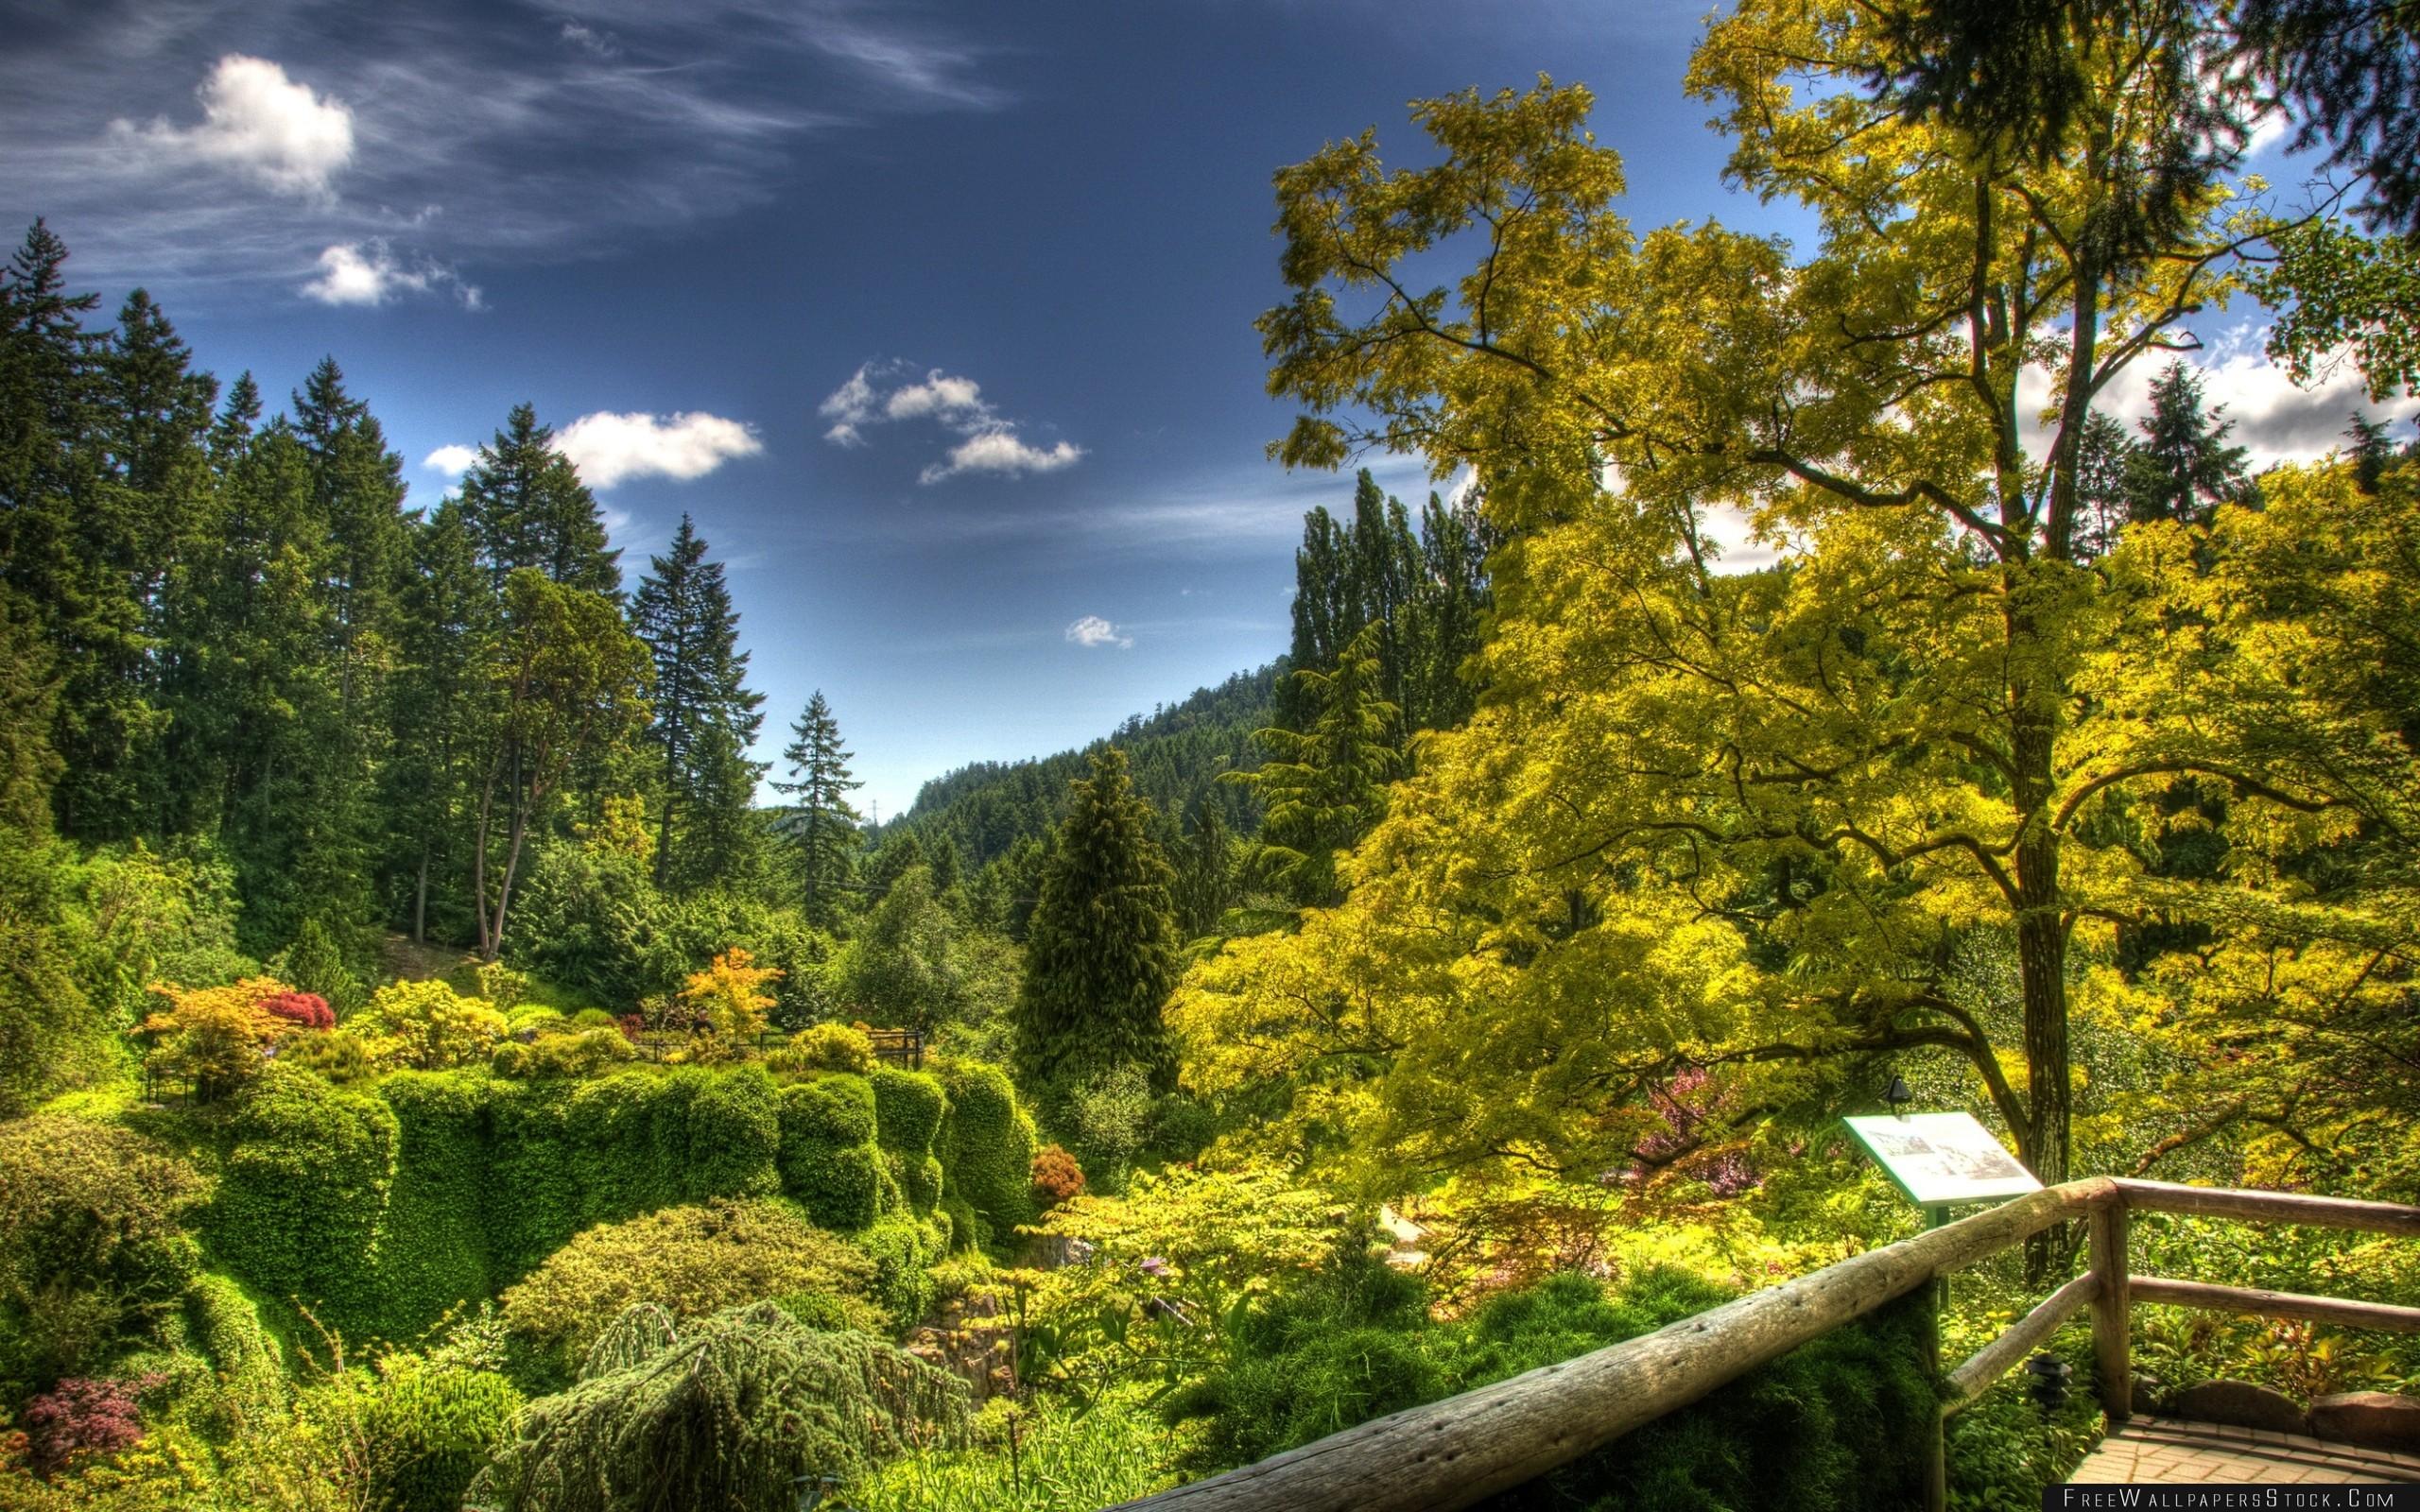 Download Free Wallpaper Tree Nursery Trees Platform Plate Brightly